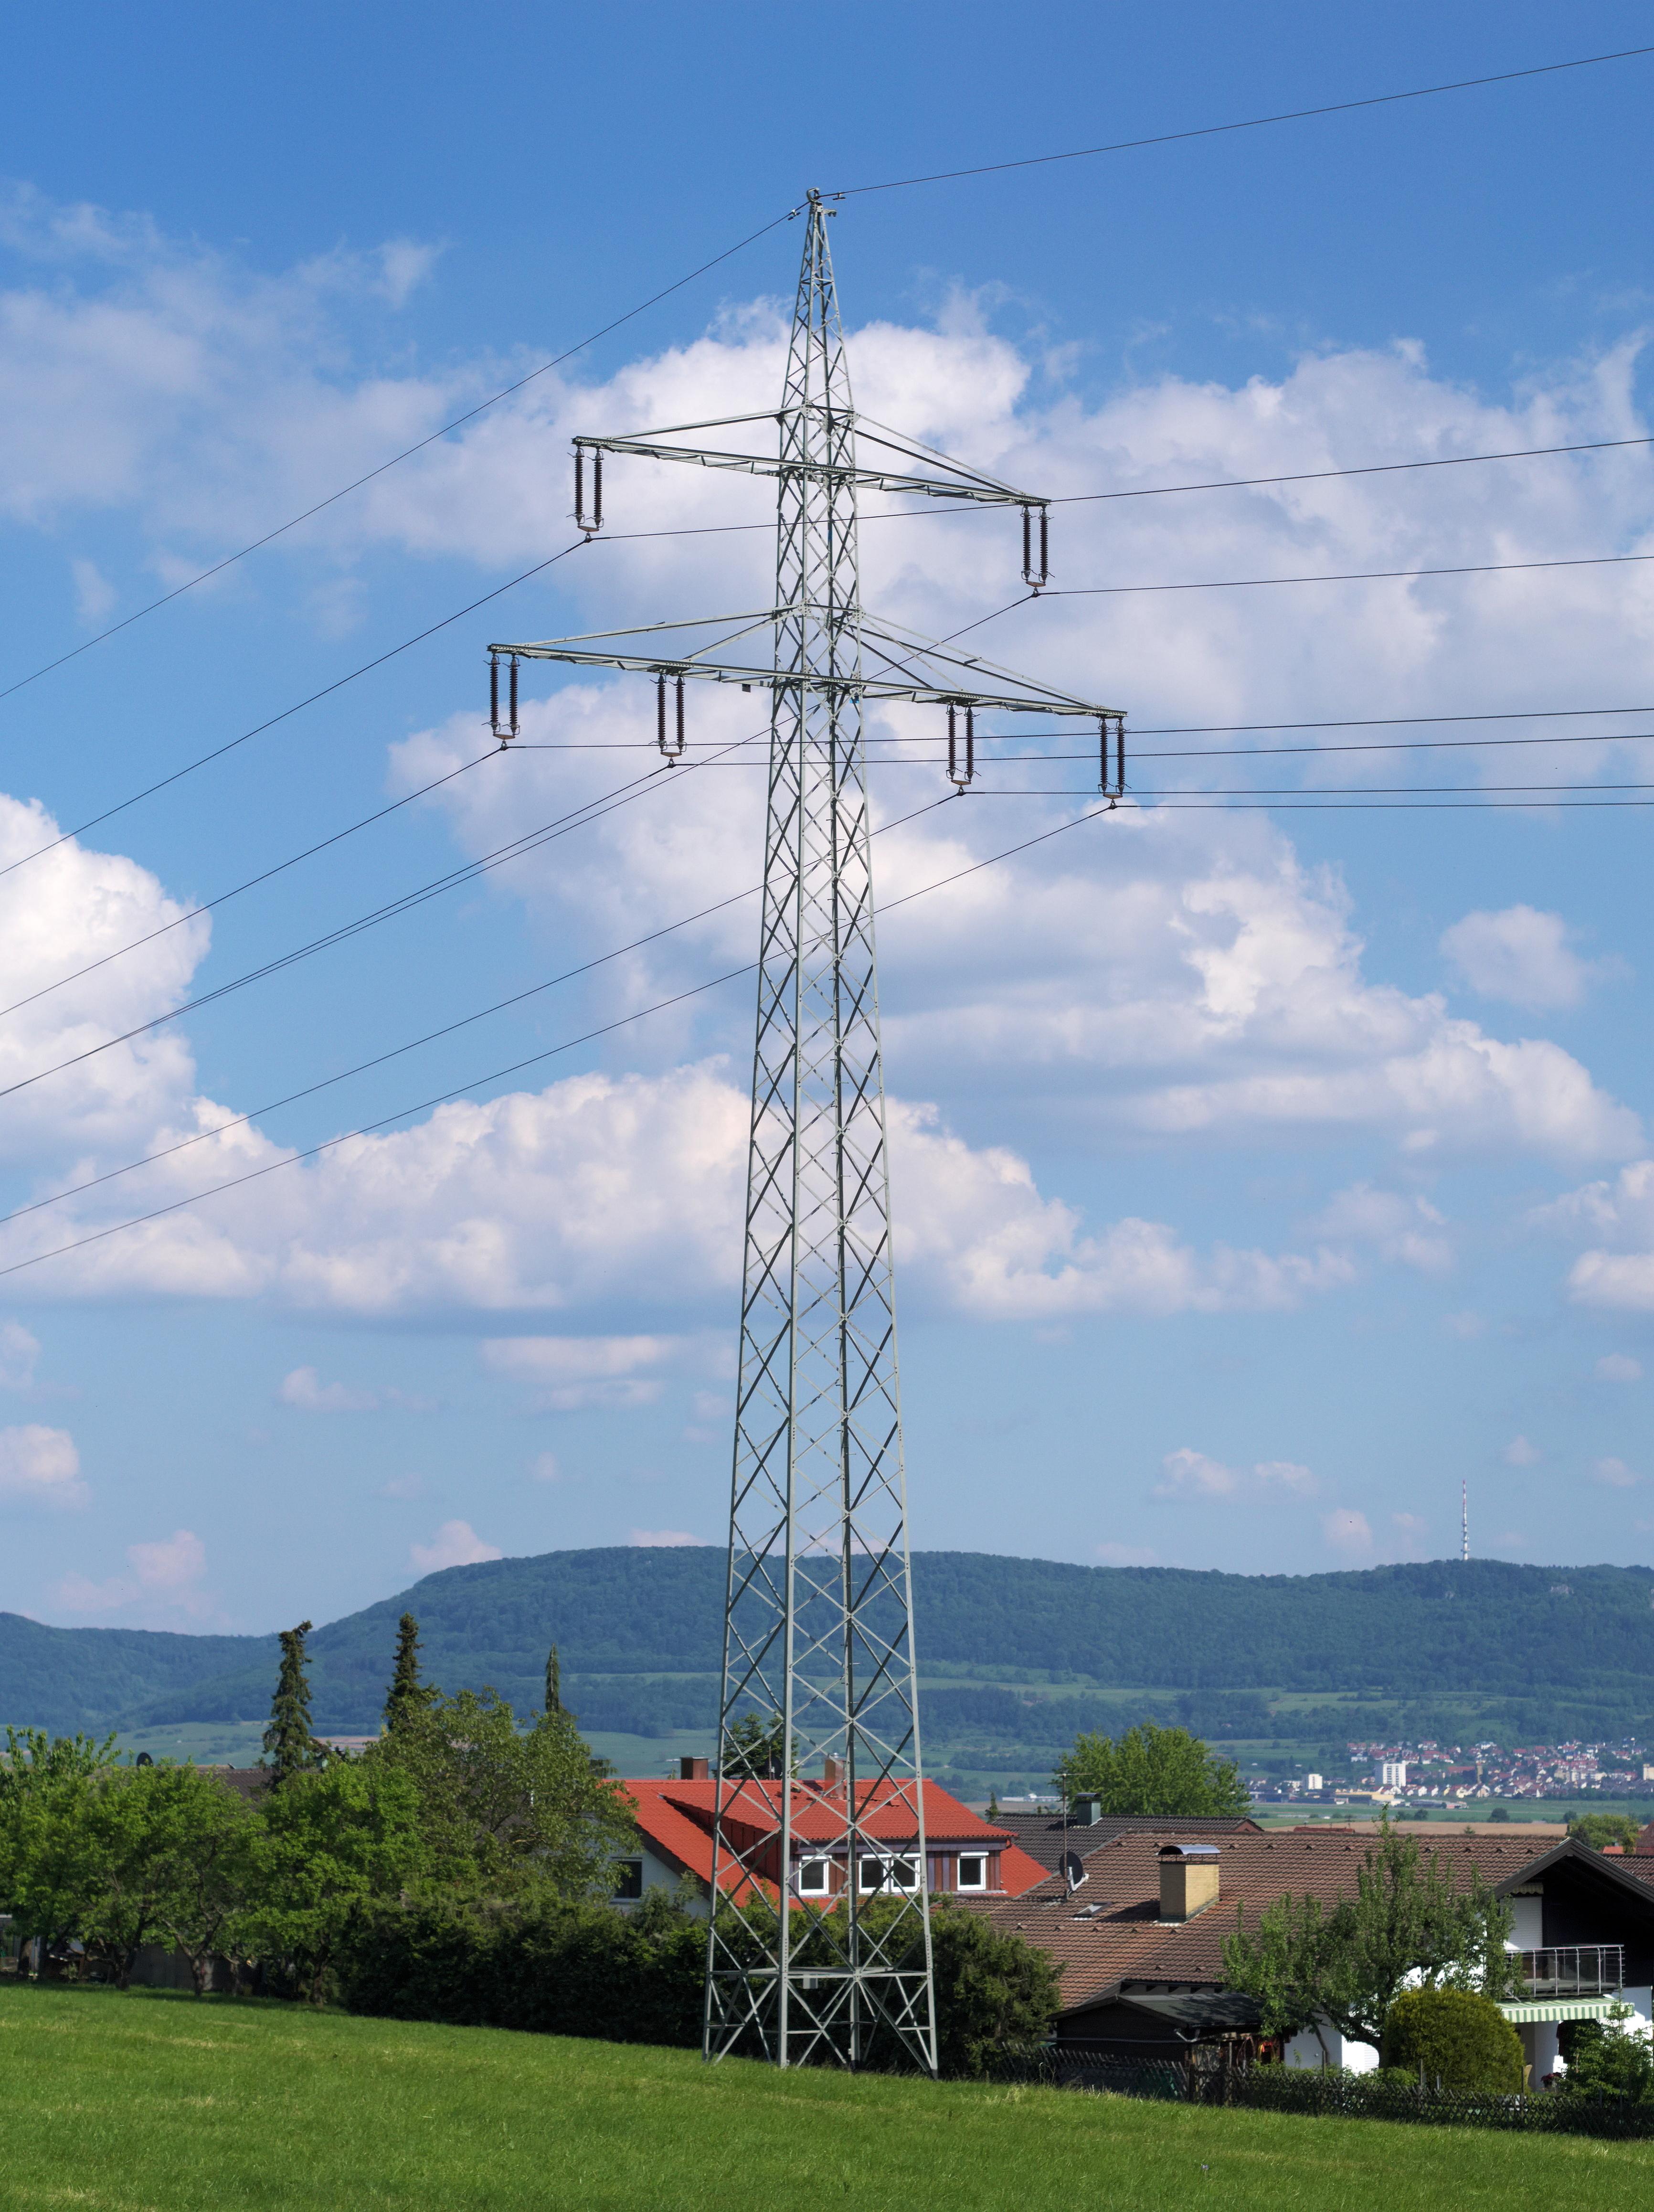 File:110-kV-Donaumast.jpg - Wikimedia Commons